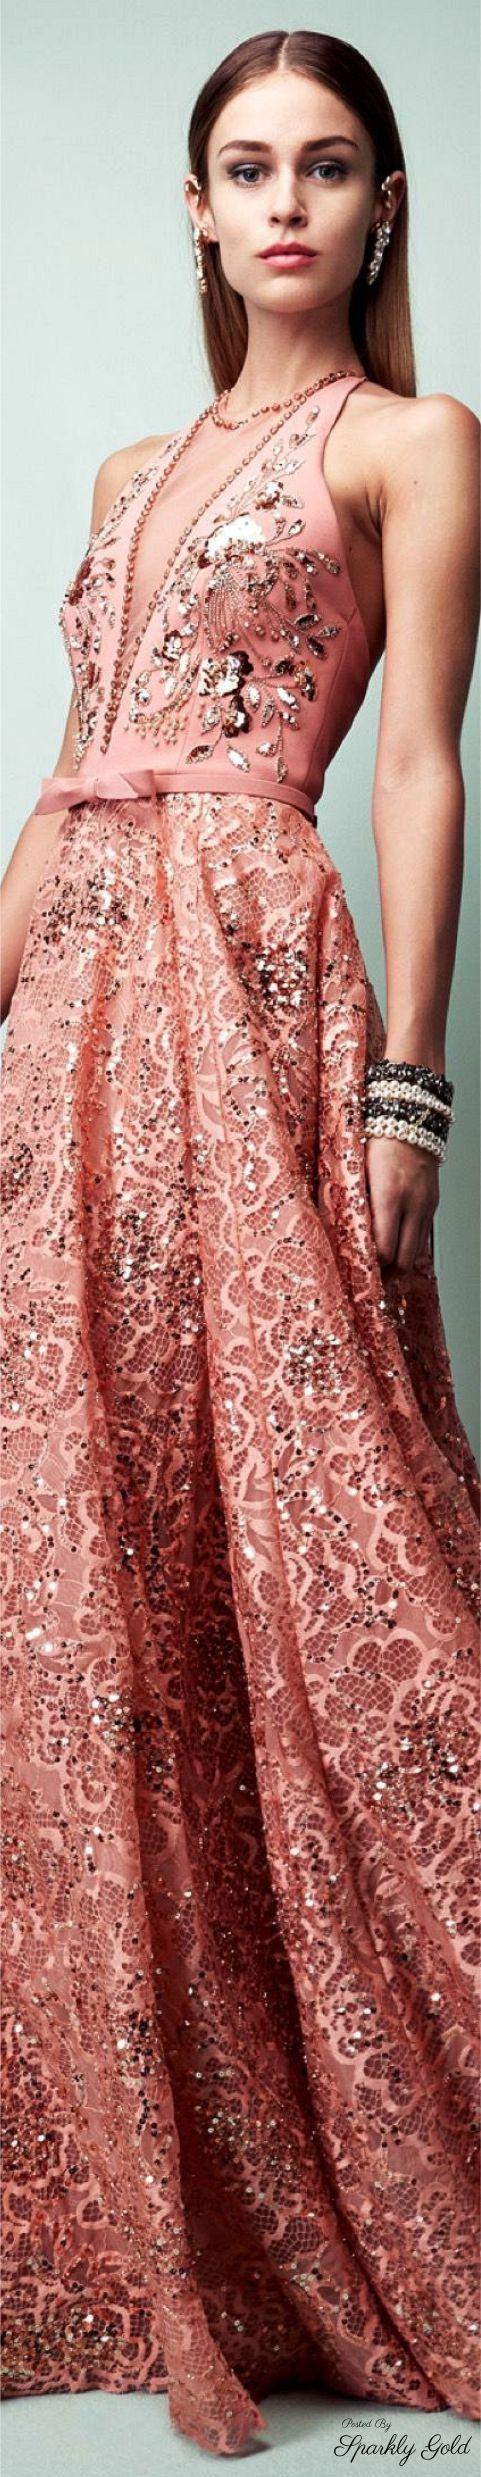 3832 best beautiful dresses images on Pinterest | Cute dresses ...